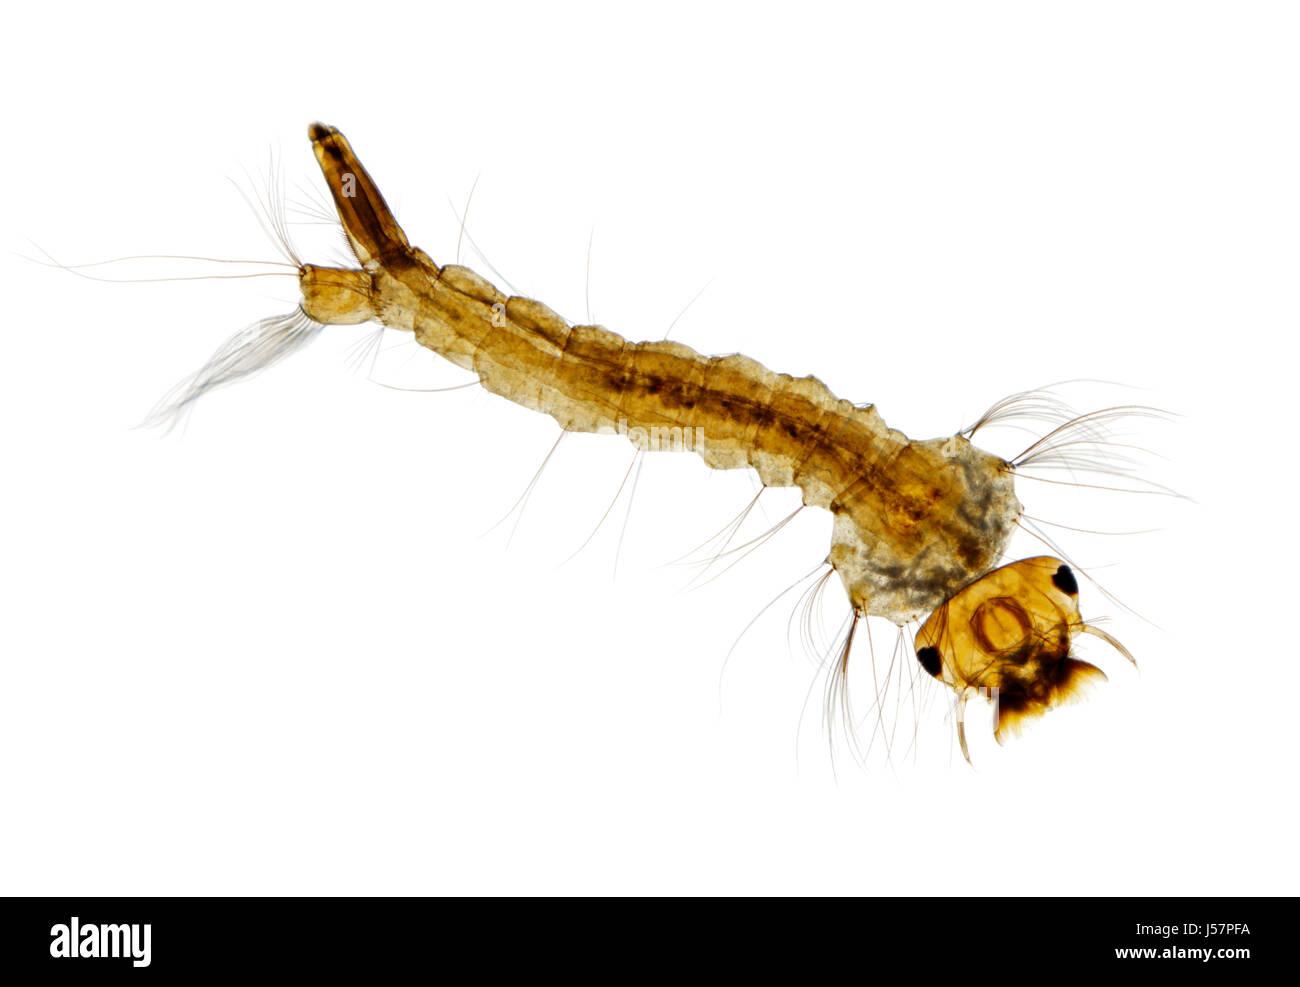 Microscopic view of Mosquito (Aedes) larva. Brightfield illumination. - Stock Image